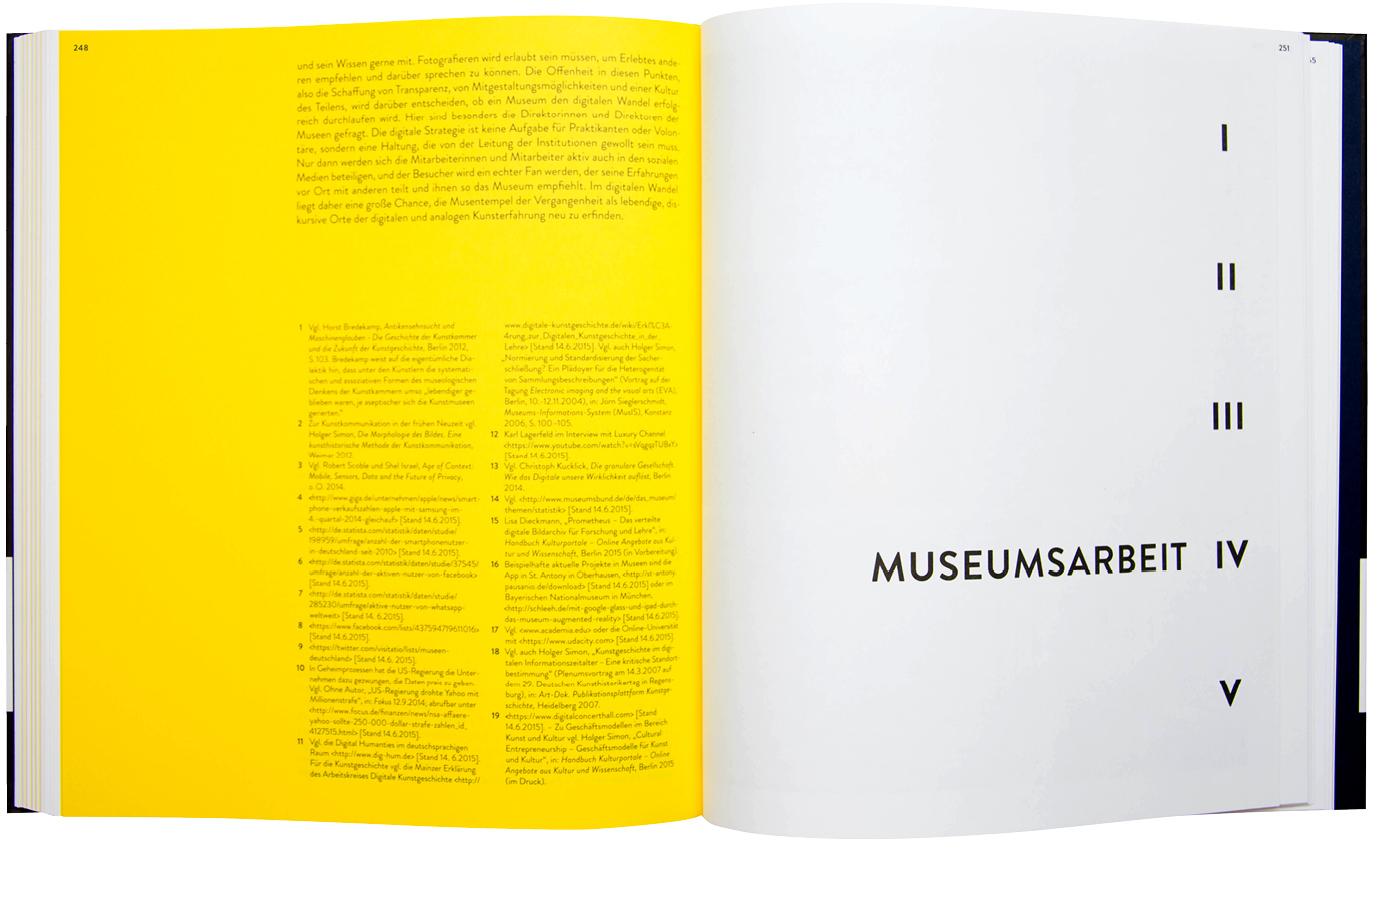 http://e-o-t.de/wordpress/wp-content/uploads/2017/06/2015_eot-BG-Jubilaeum-Book-18.jpg